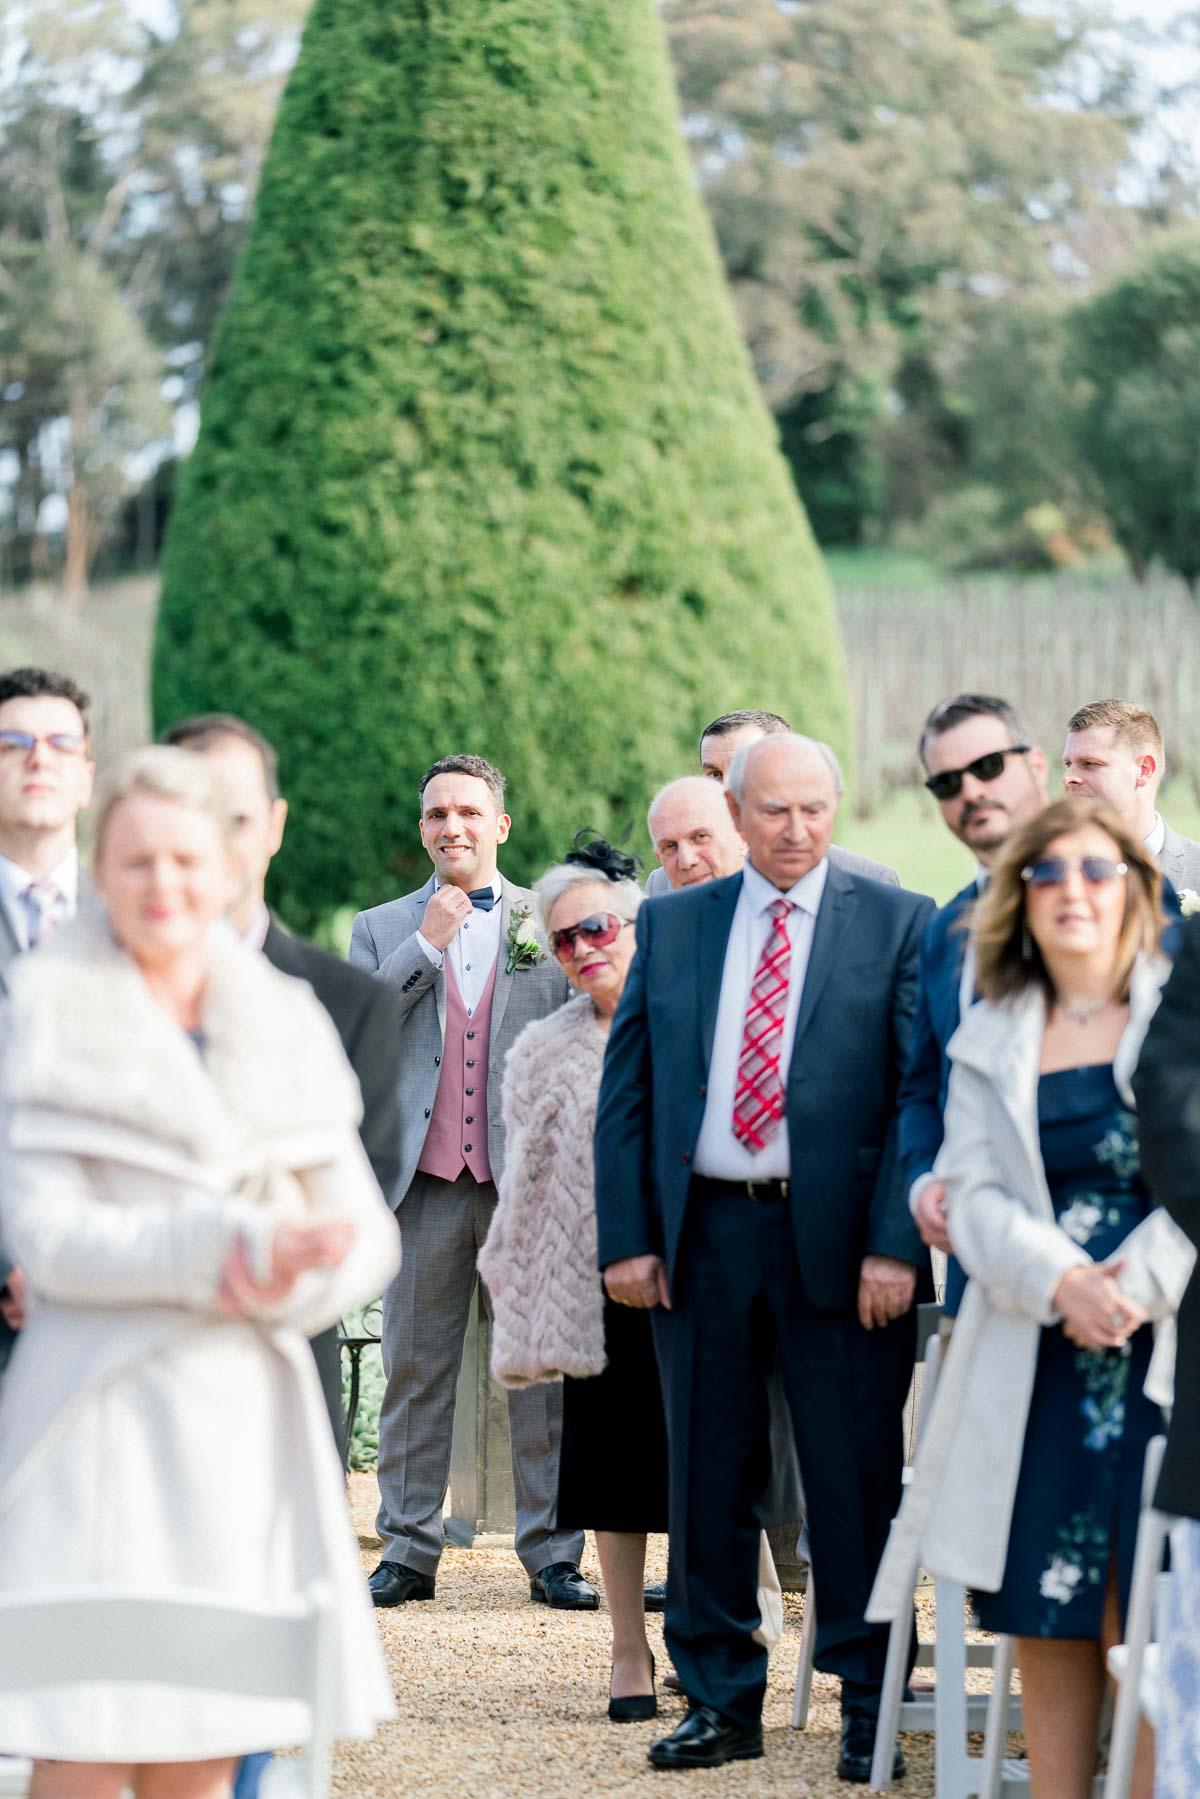 lindenderry-wedding-heart+soul-weddings-amy-alain-03211.jpg